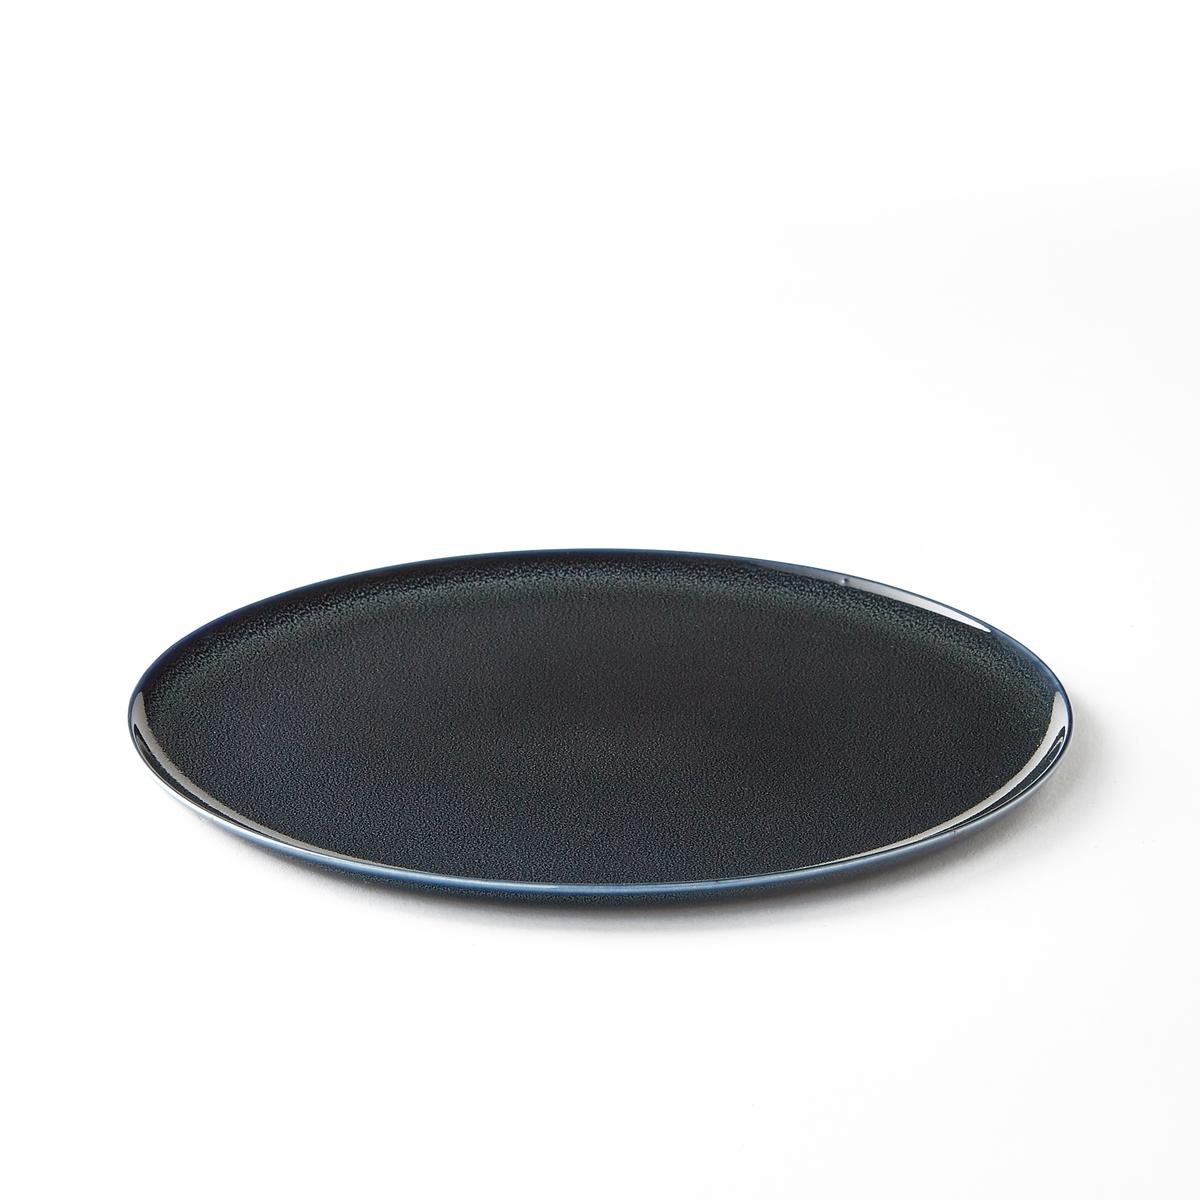 Тарелка мелкая из керамики, диаметр 26 см, Banoka